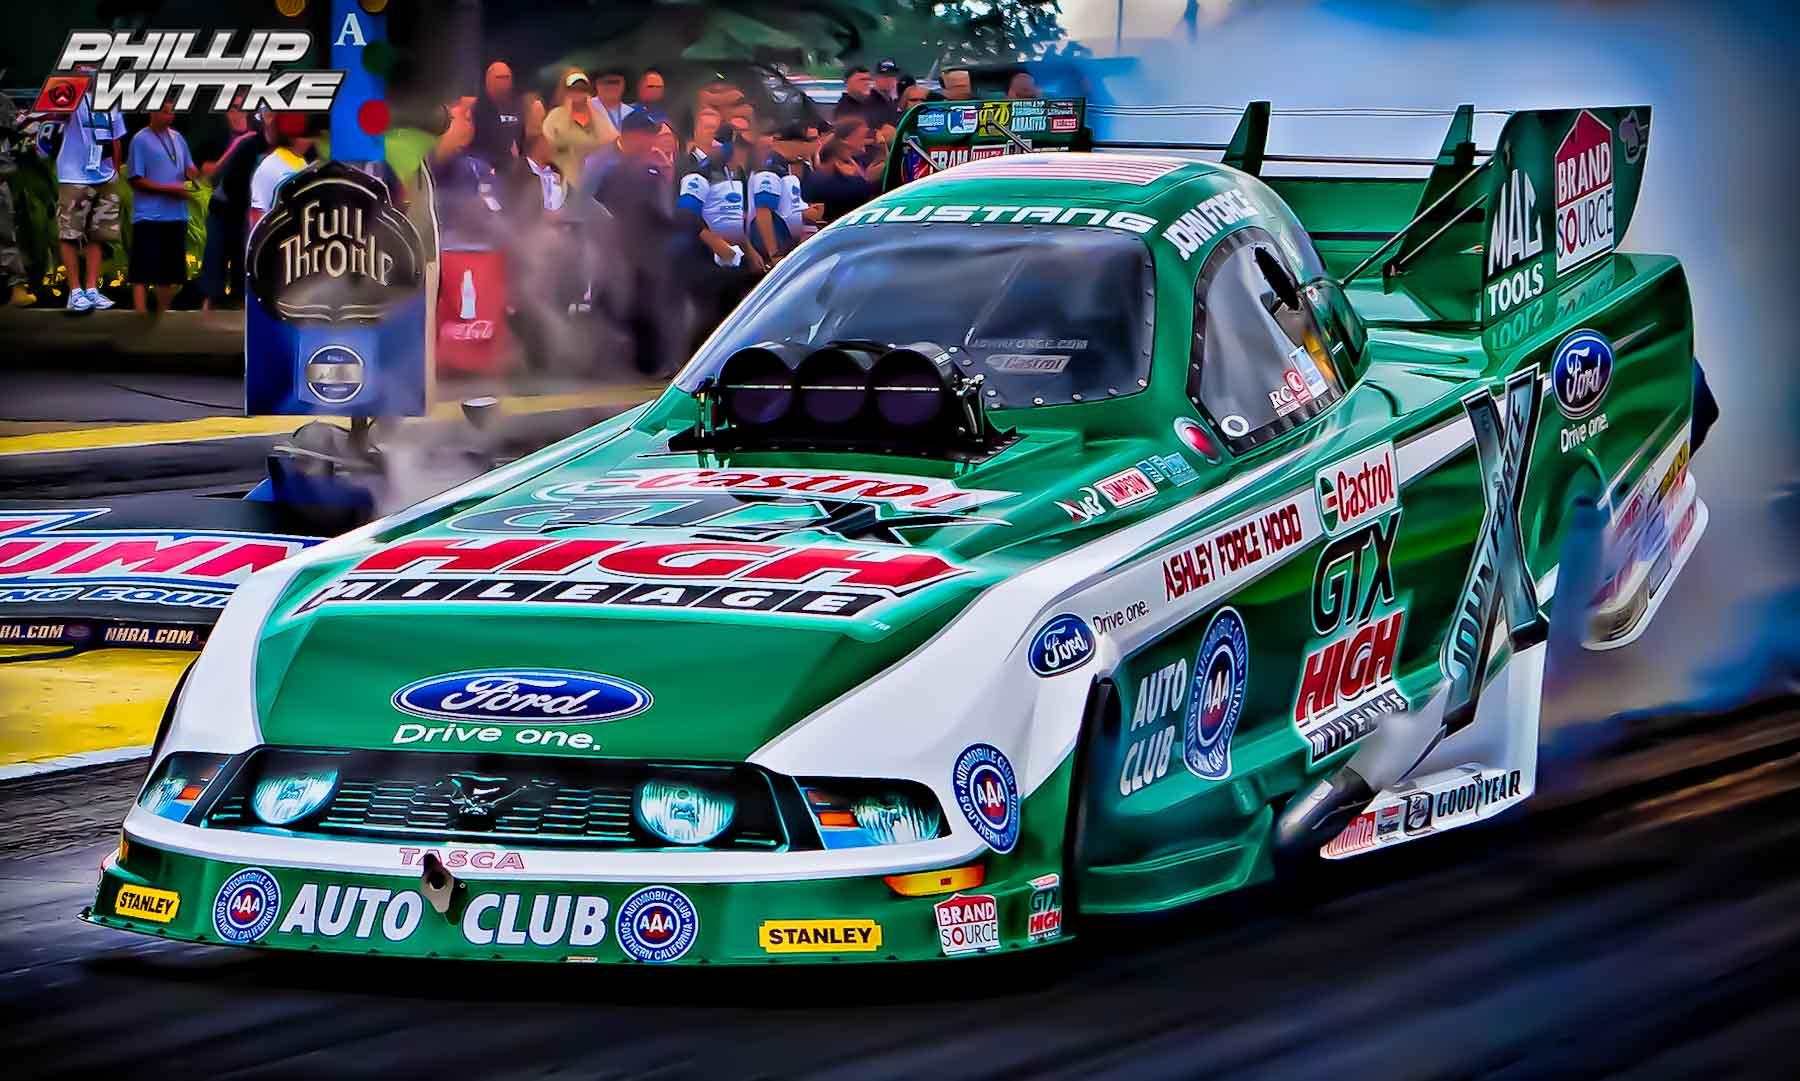 NHRA funny cars race racing drag gw wallpaper background 1800x1081